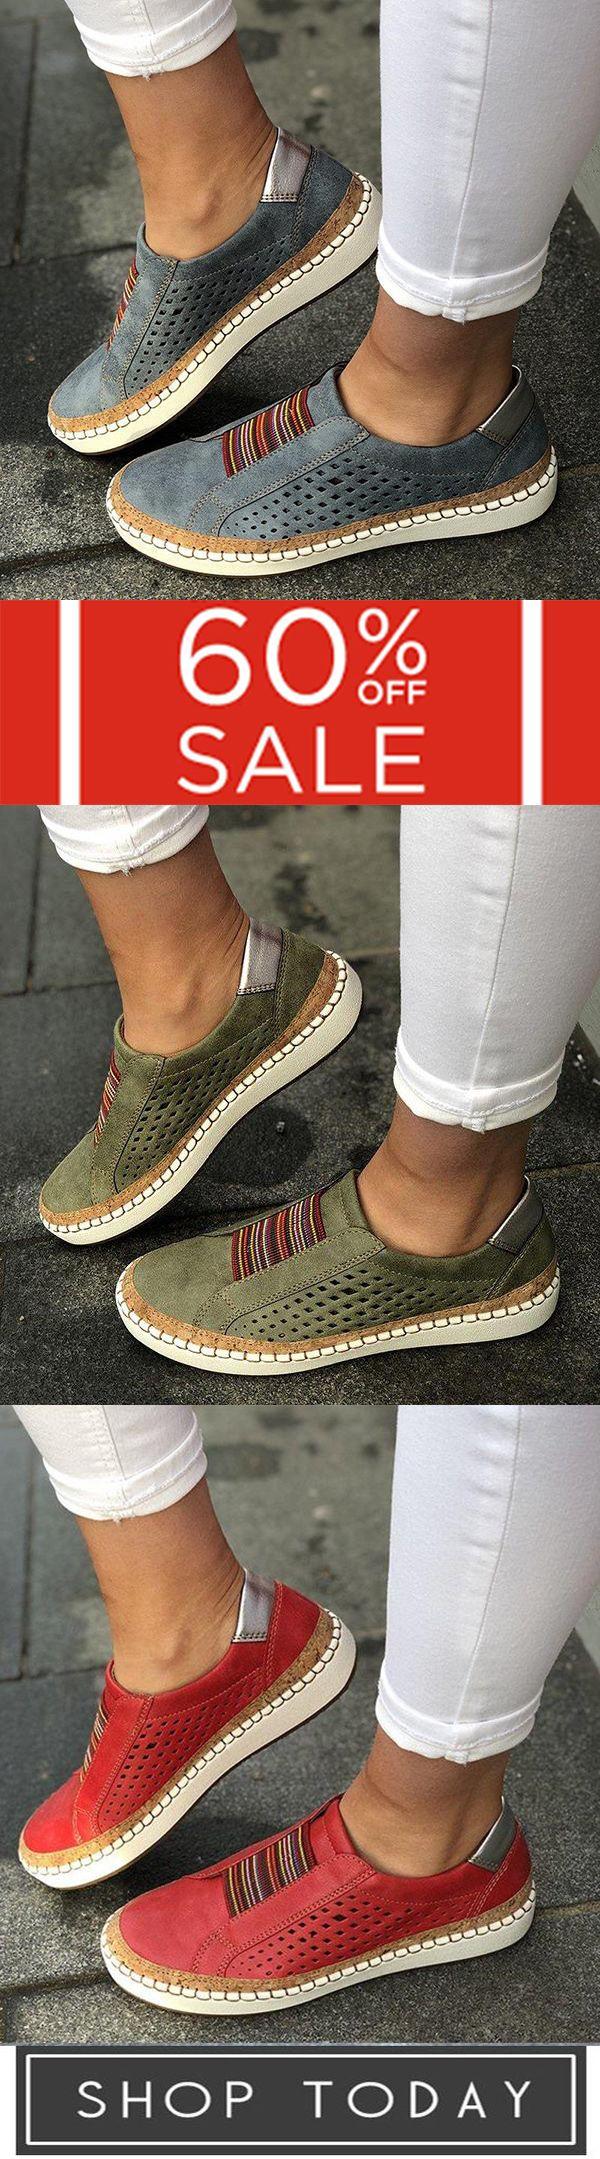 Comfortable Flat Bottom Breathable Shoes 2